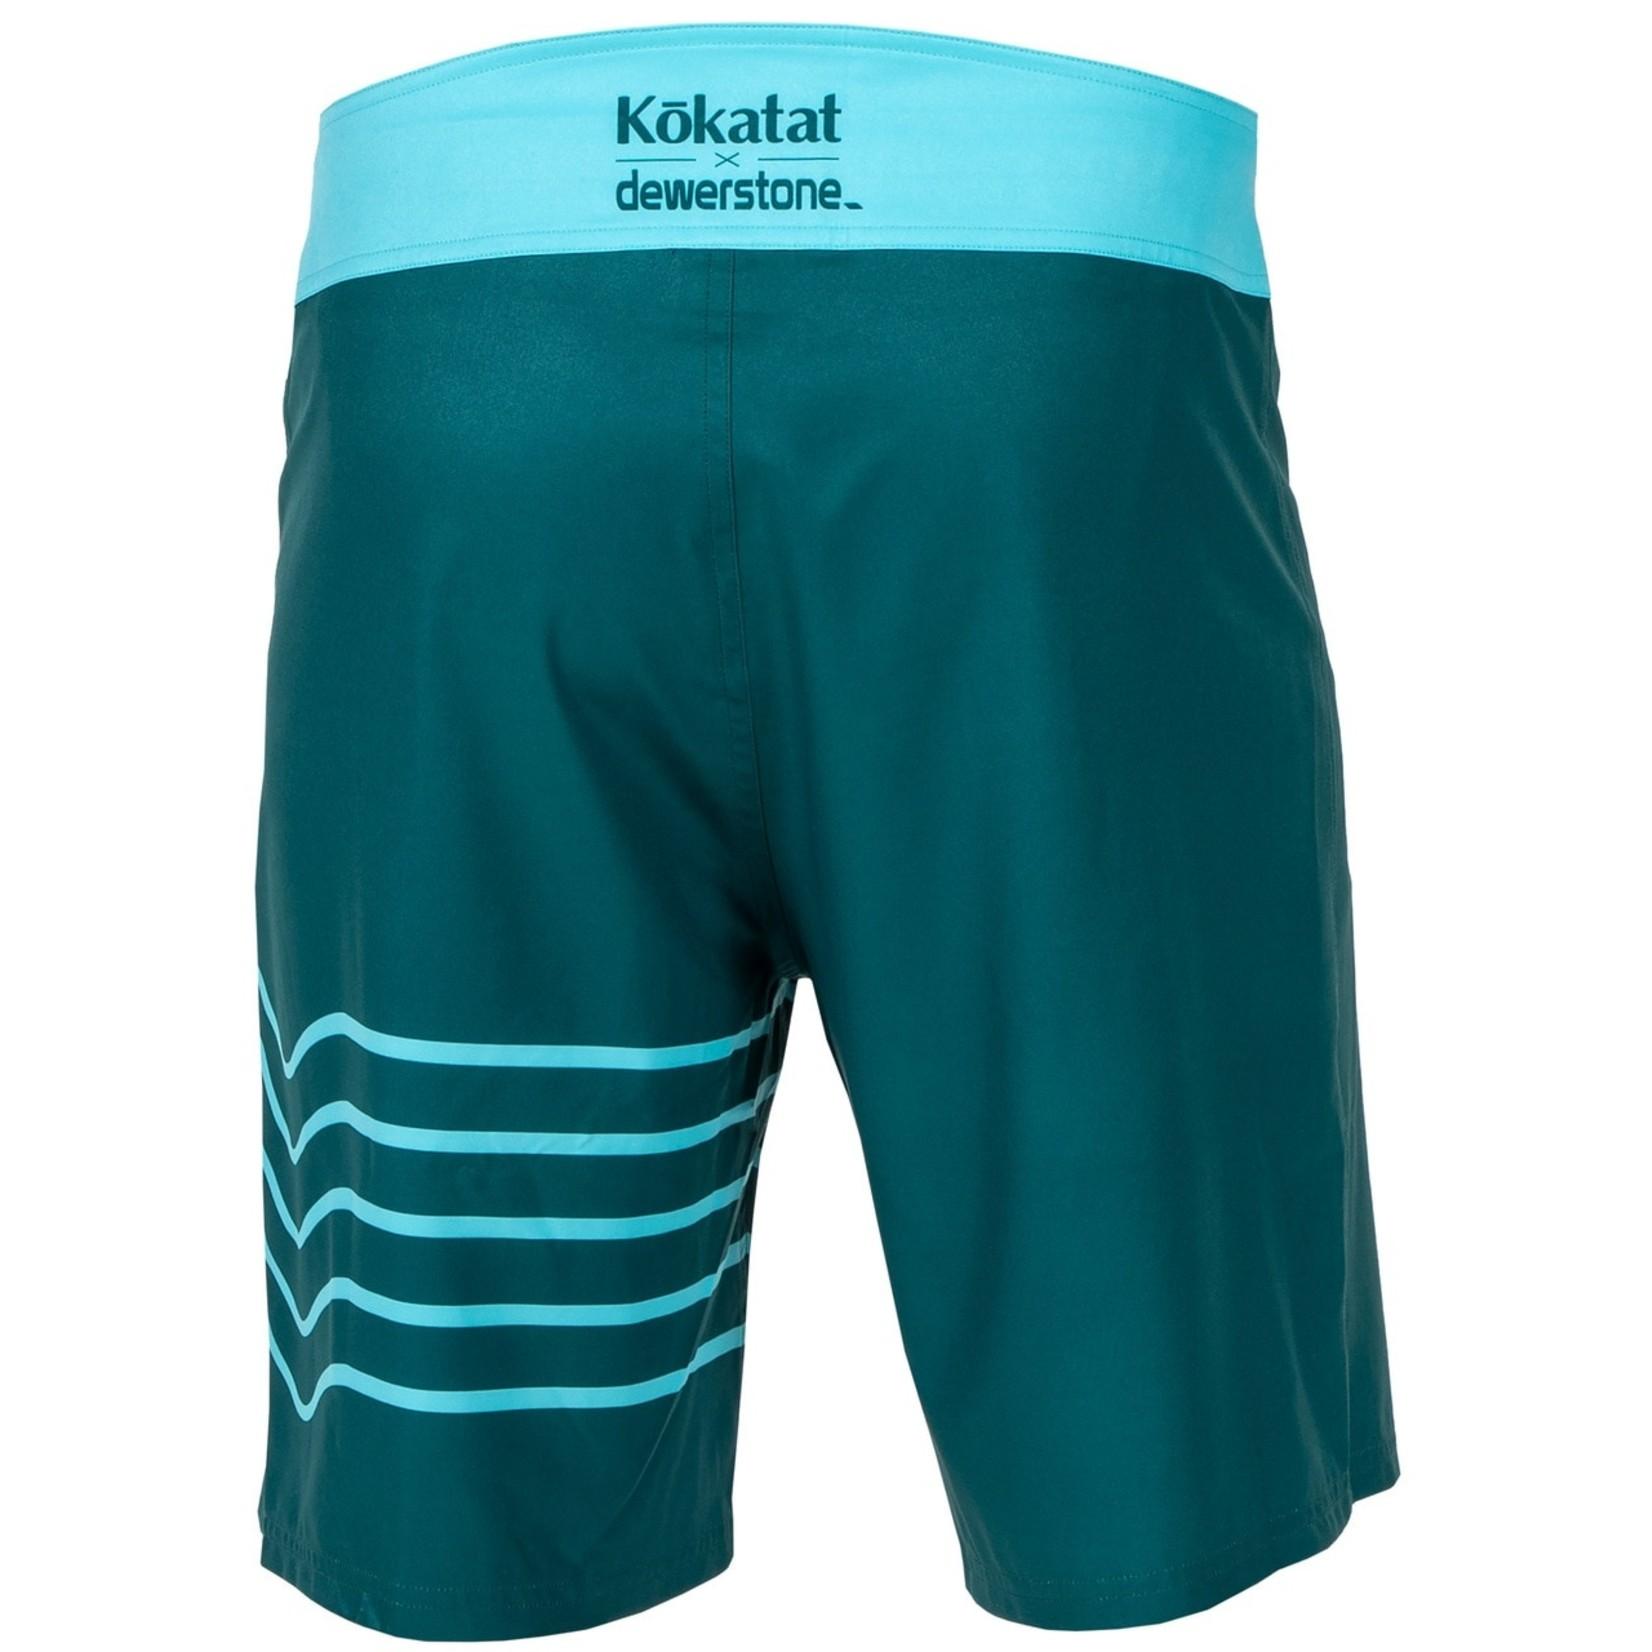 Kokatat Kokatat Men's Dewerstone Life Short 2.0 LE